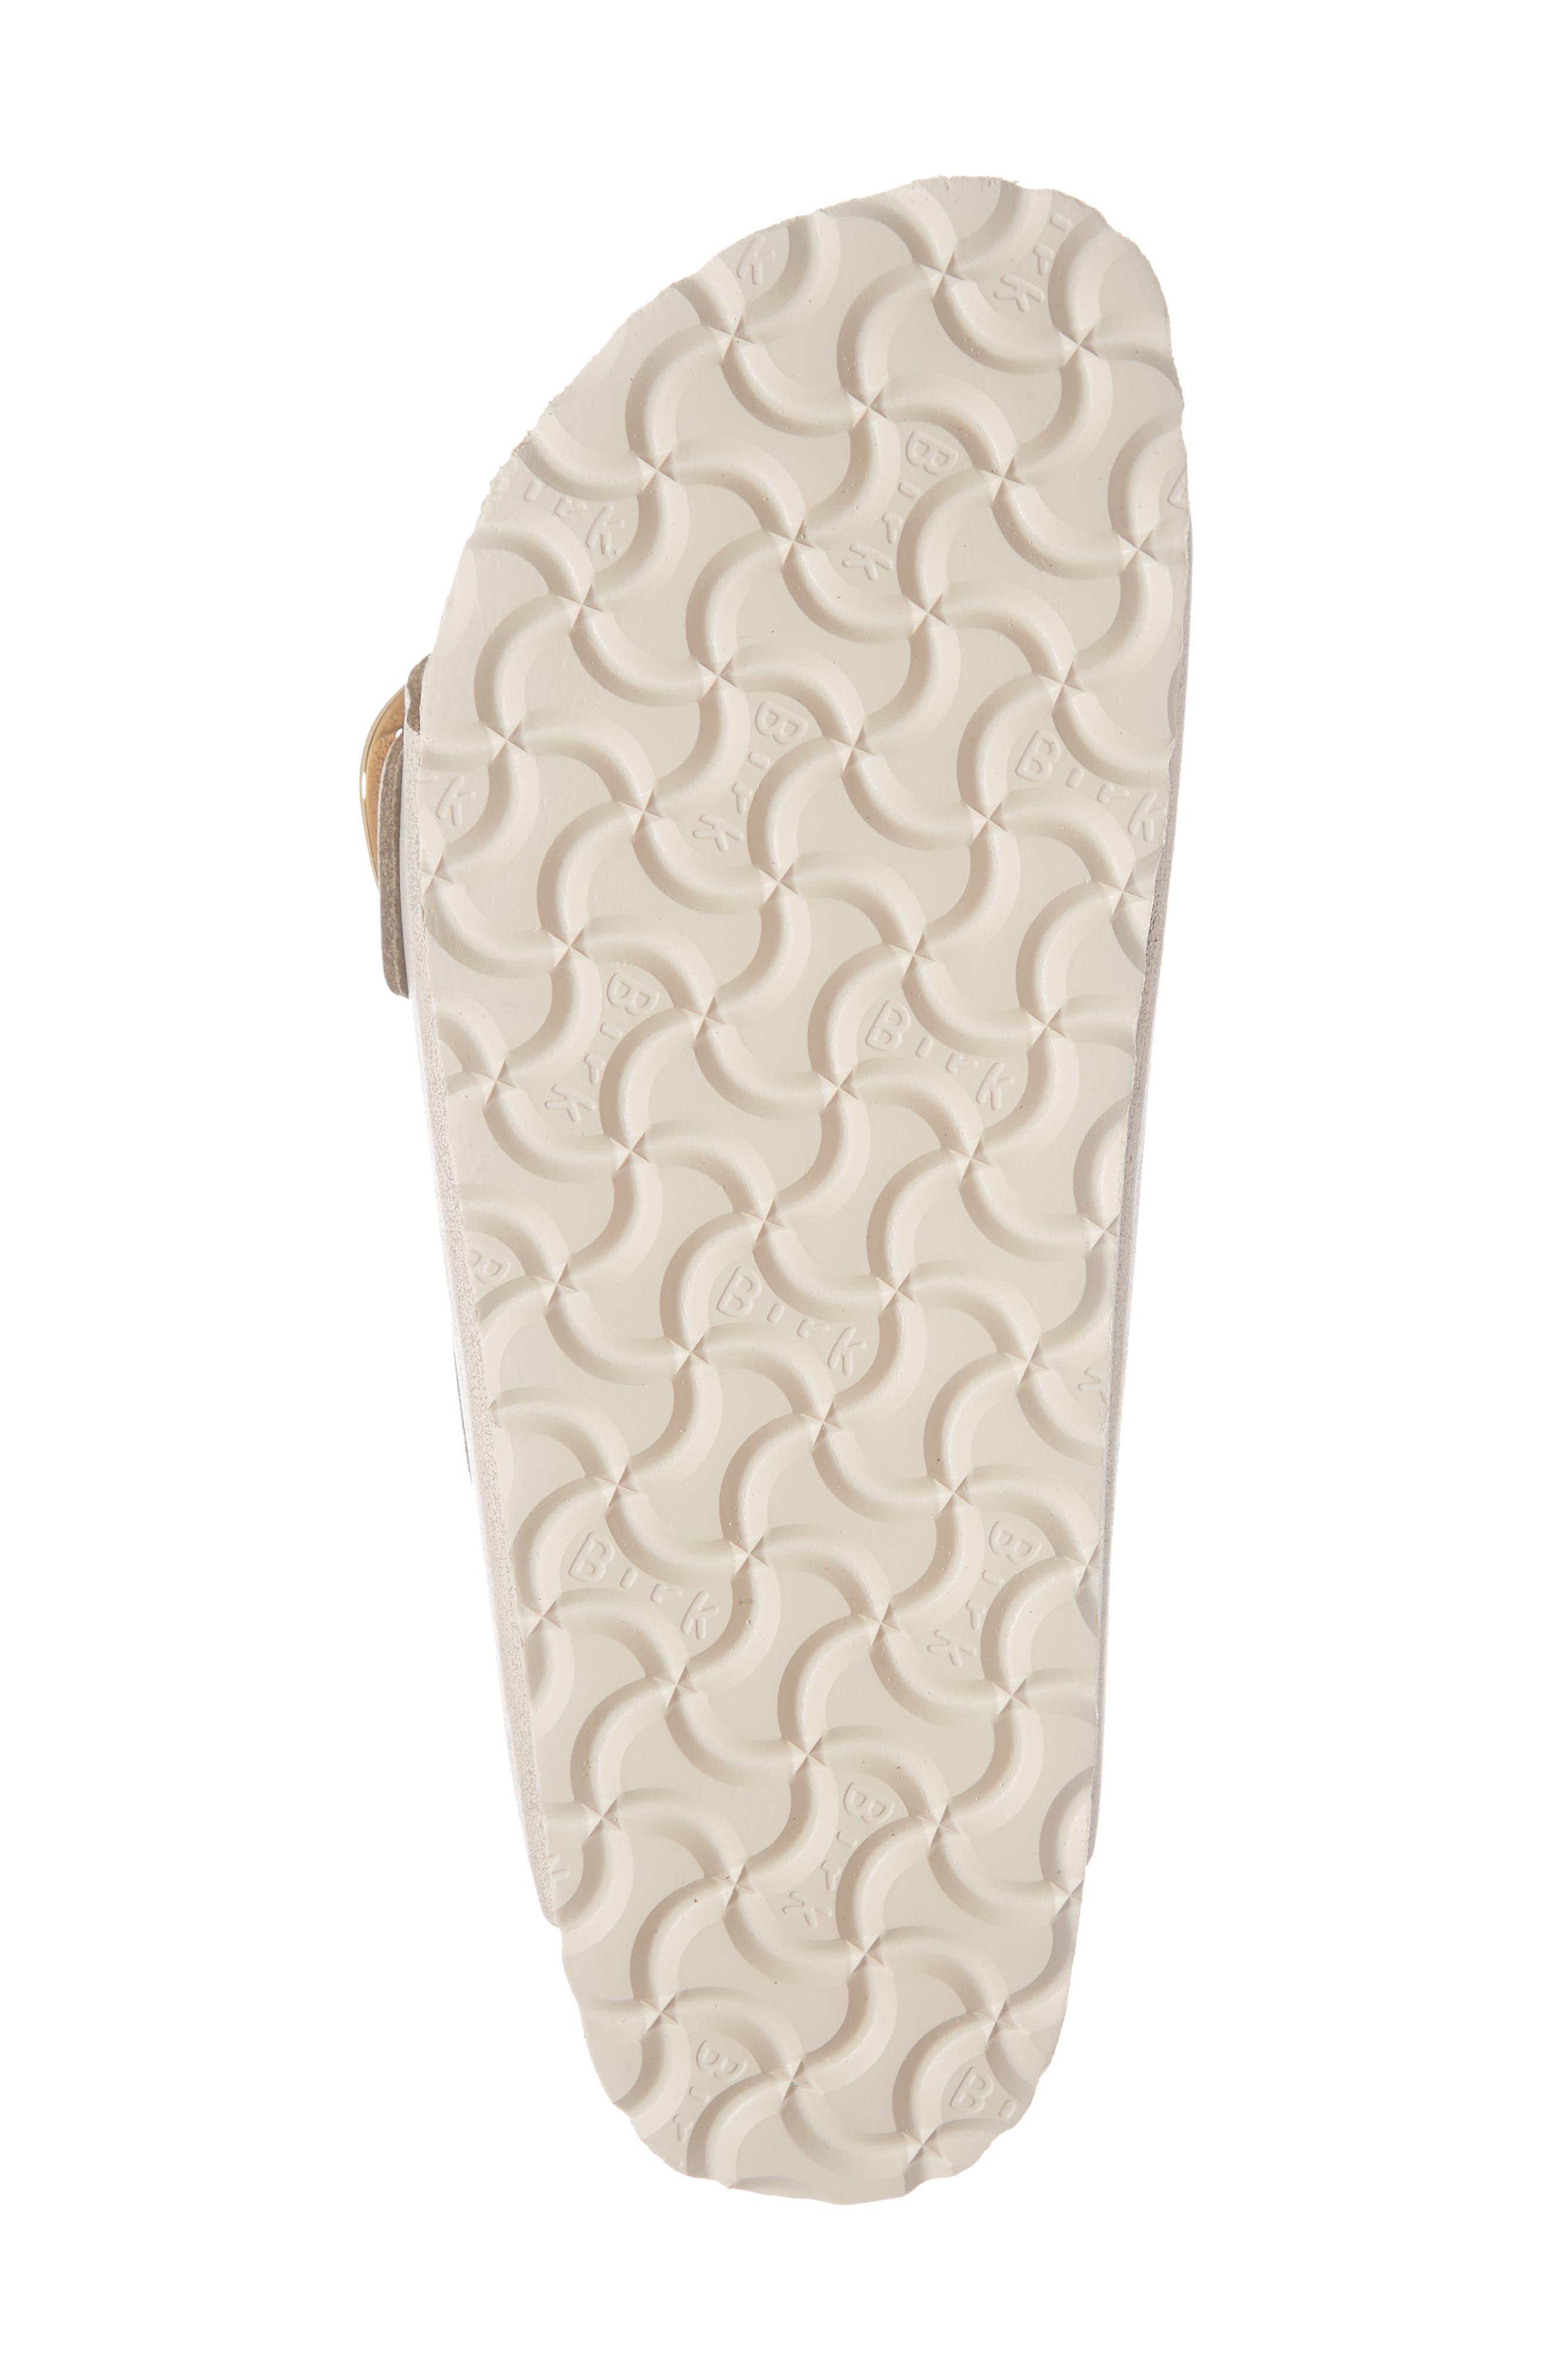 BIRKENSTOCK, Arizona Big Buckle Slide Sandal, Alternate thumbnail 6, color, WASHED METALLIC ROSE LEATHER